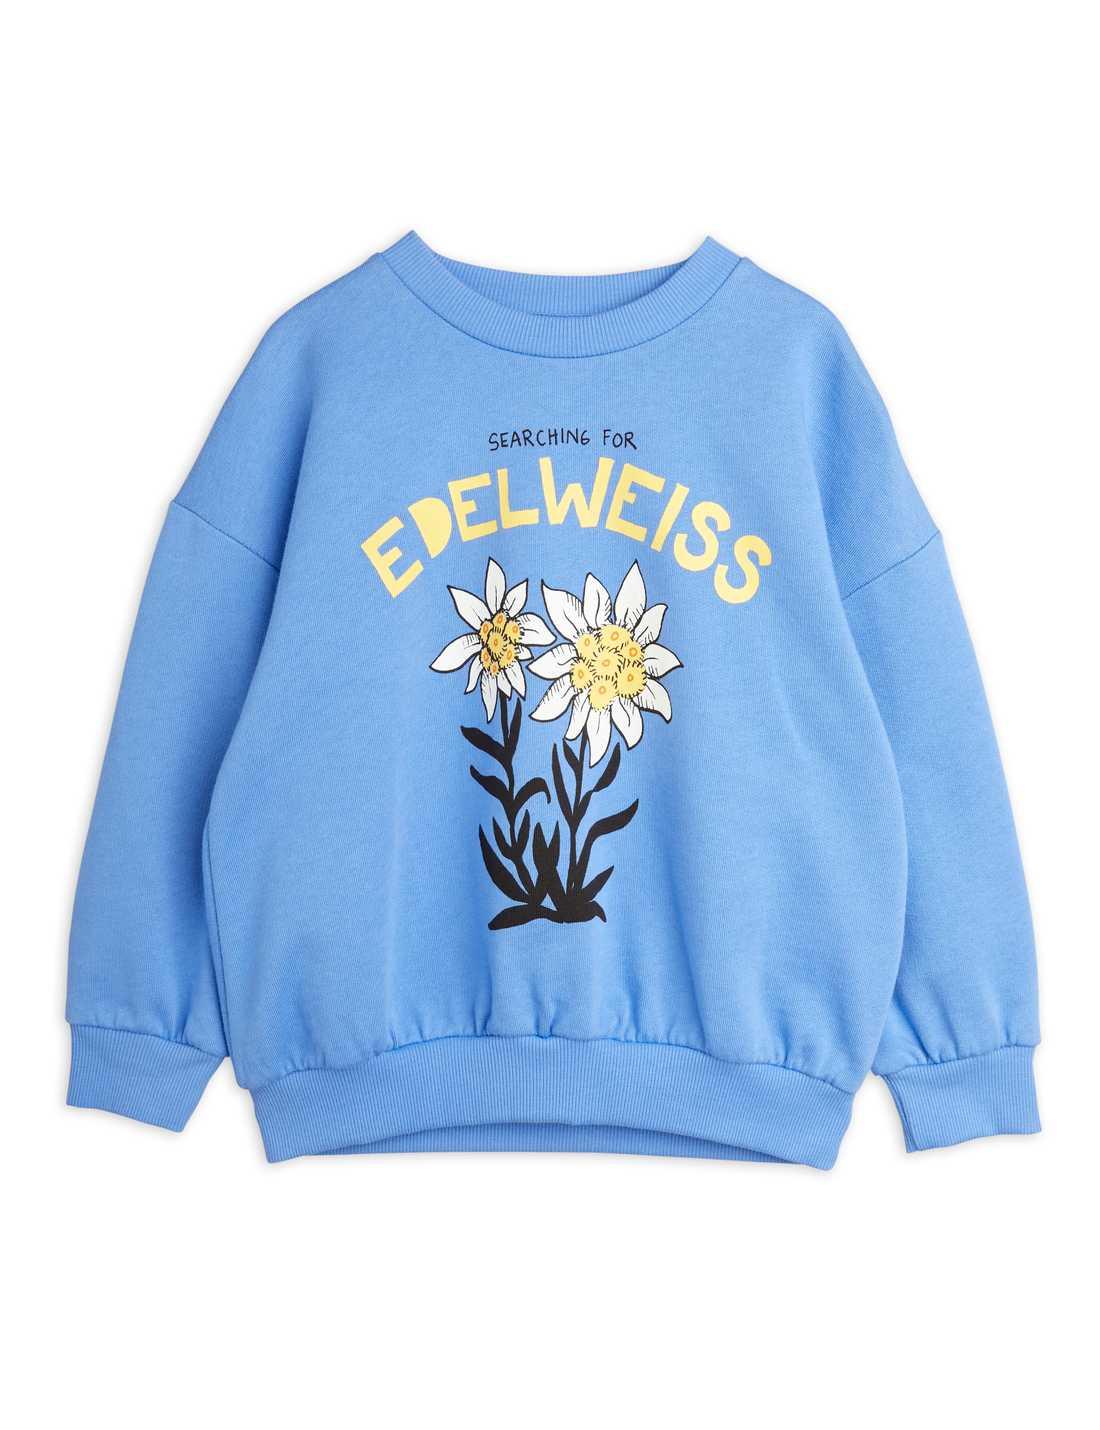 MINI RODINI EDLEWEISS SP SWEATSHIRT BLUE